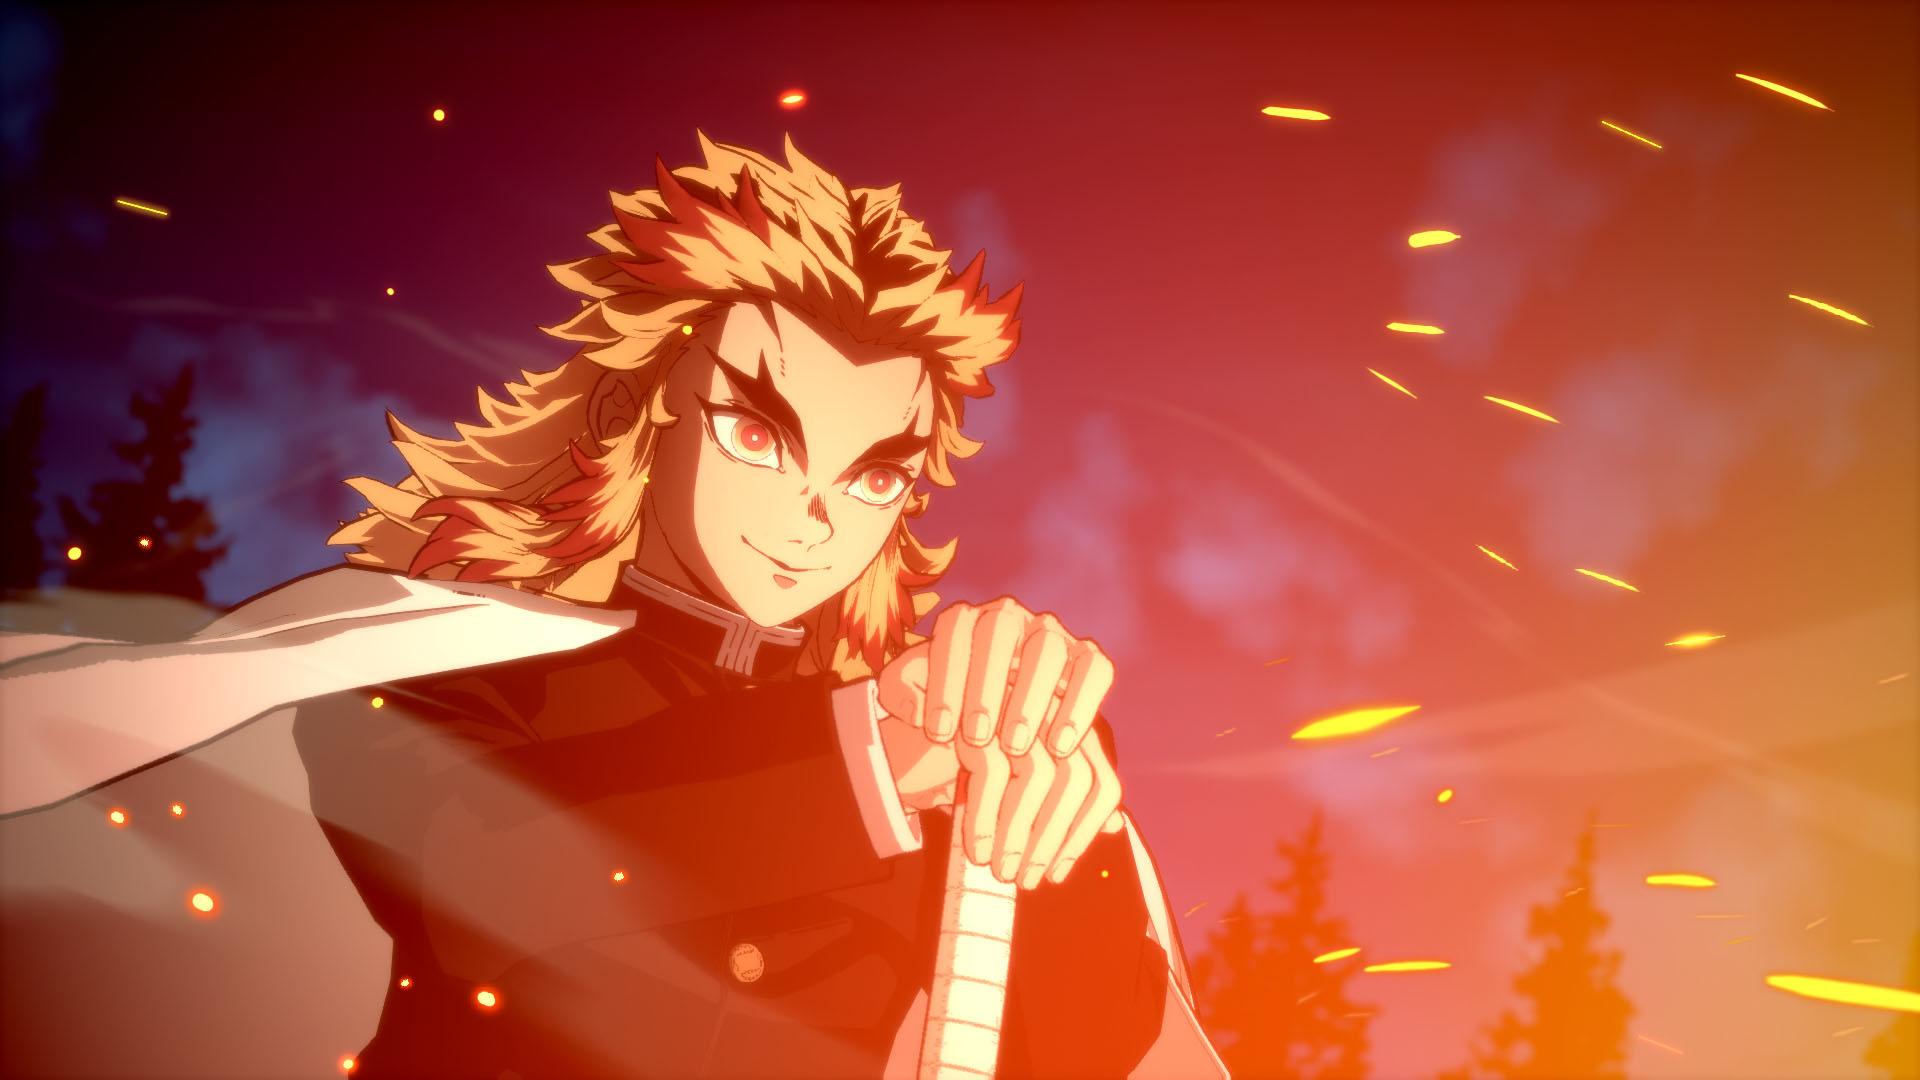 Demon Slayer Kimetsu no Yaiba The Hinokami Chronicles - Announce (17)-36360360cce905776859